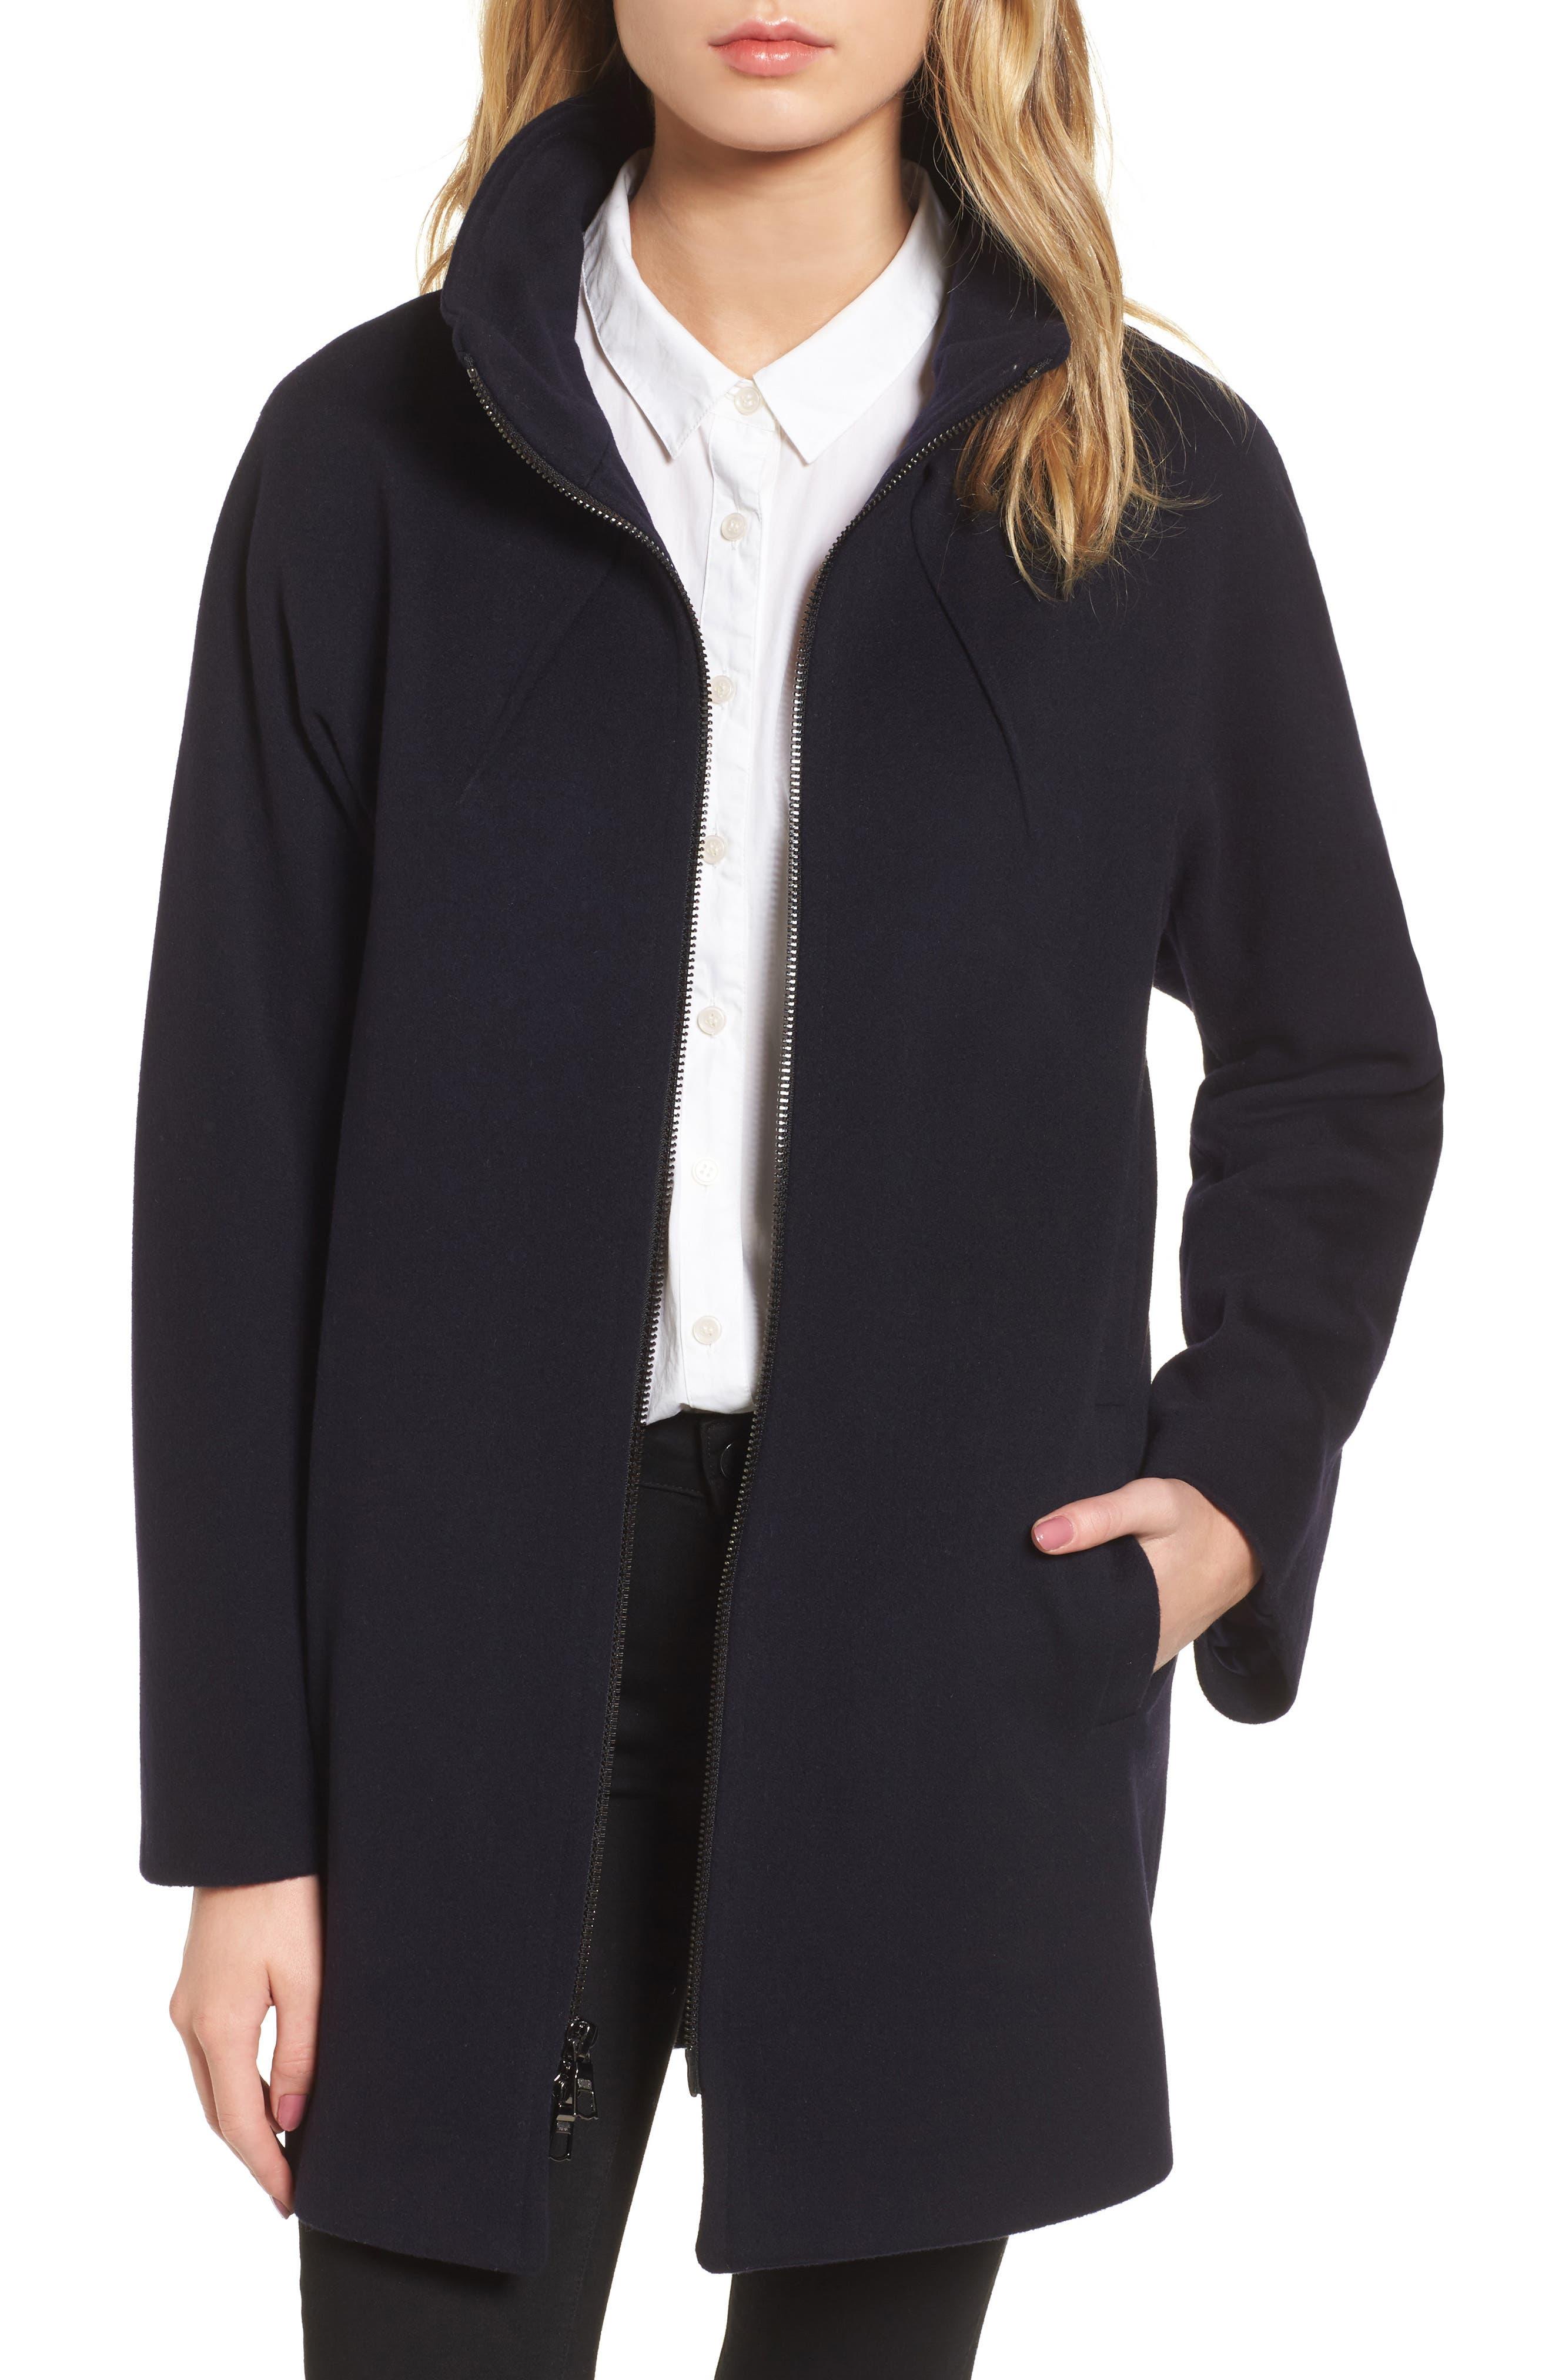 Alternate Image 1 Selected - Sofia Cashmere Dolman Sleeve Coat